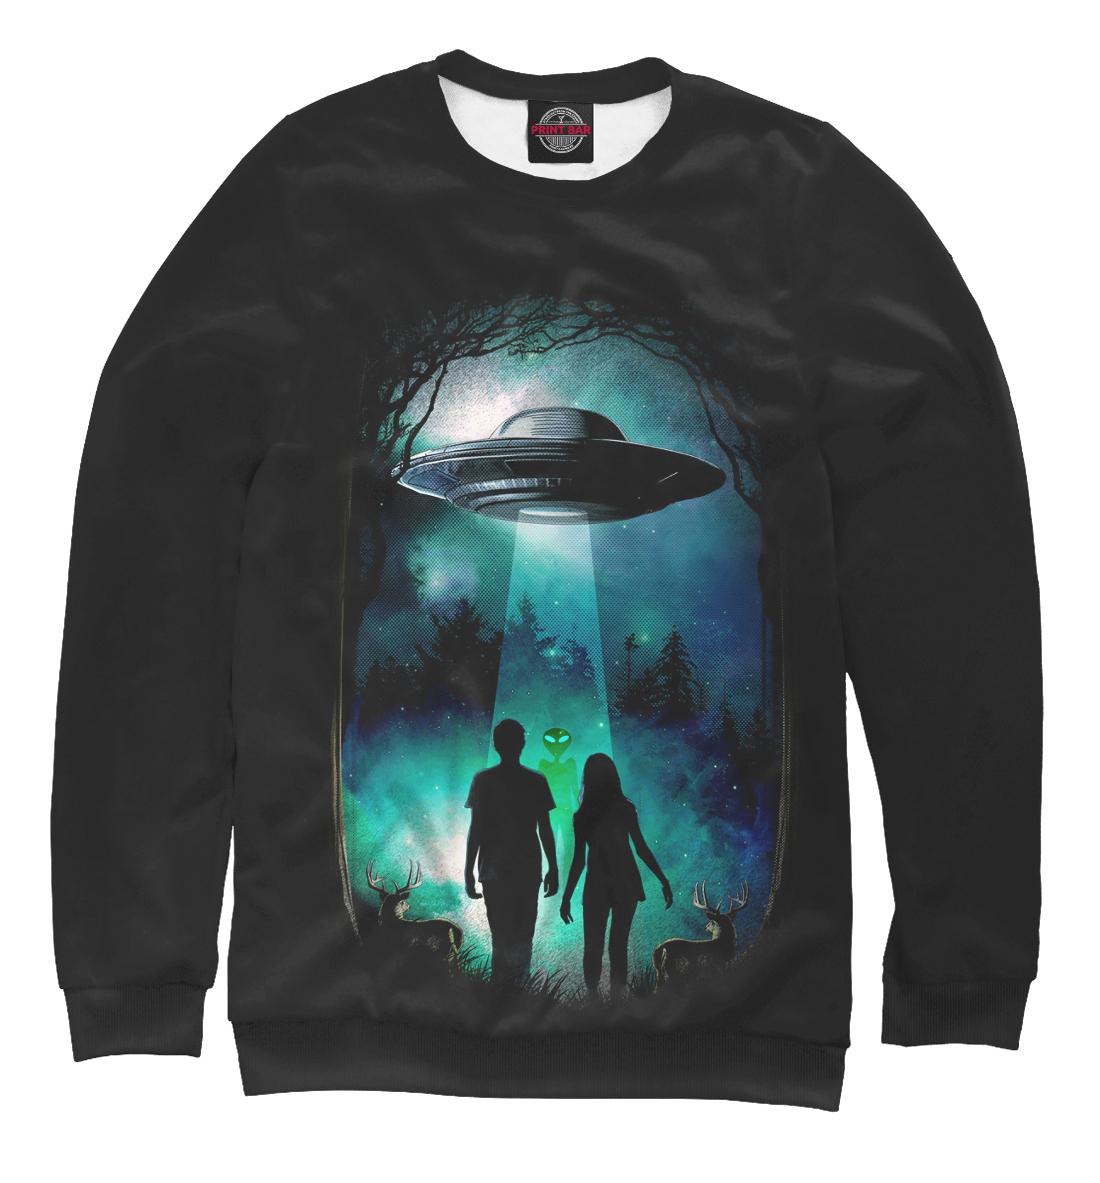 Купить Aliens, Printbar, Свитшоты, APD-757970-swi-1